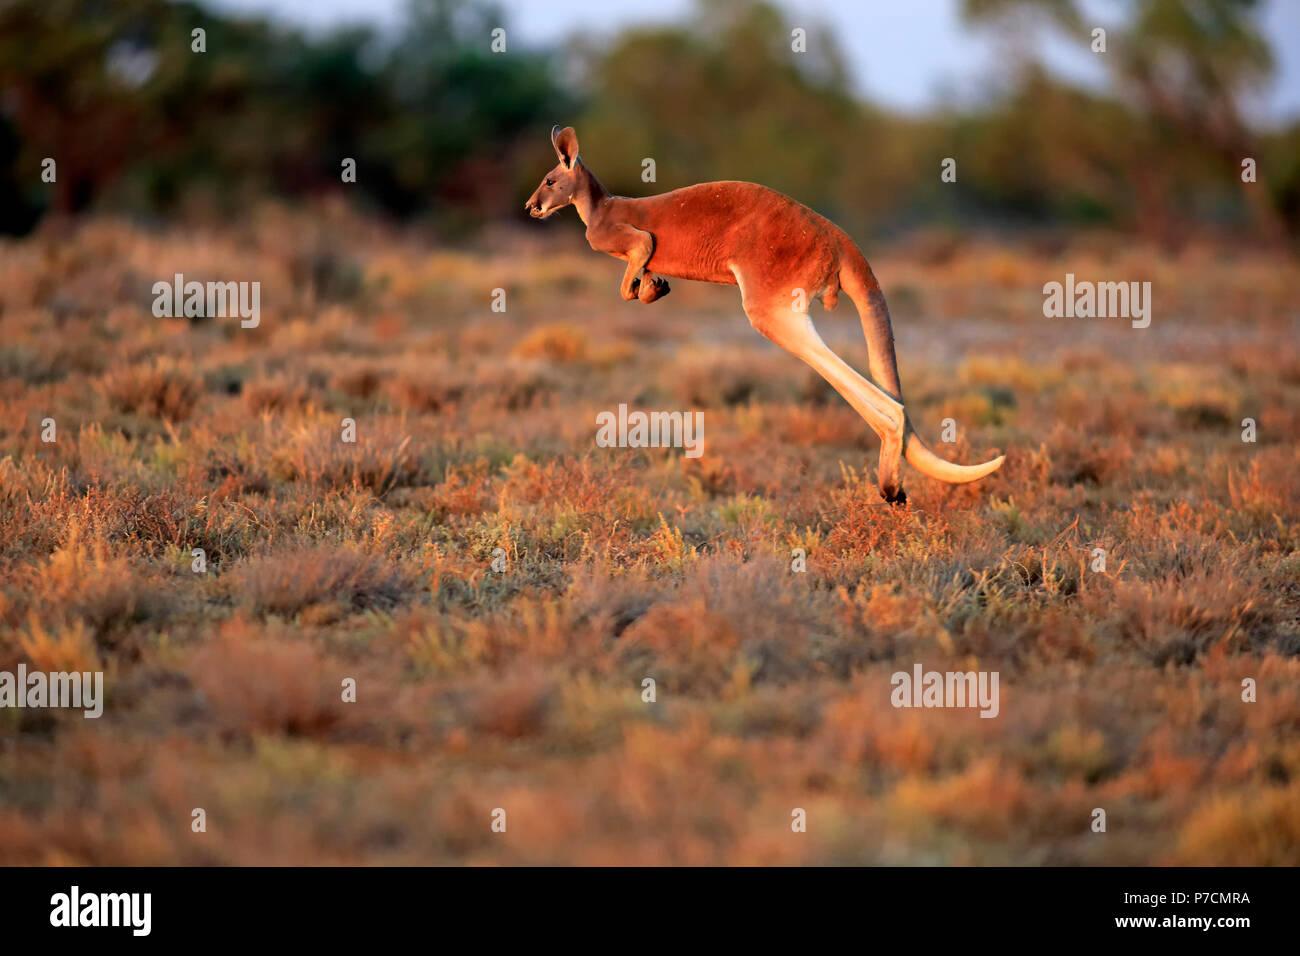 Red Kangaroo, adult male jumping, Sturt Nationalpark, New South Wales, Australia, (Macropus rufus) Stock Photo